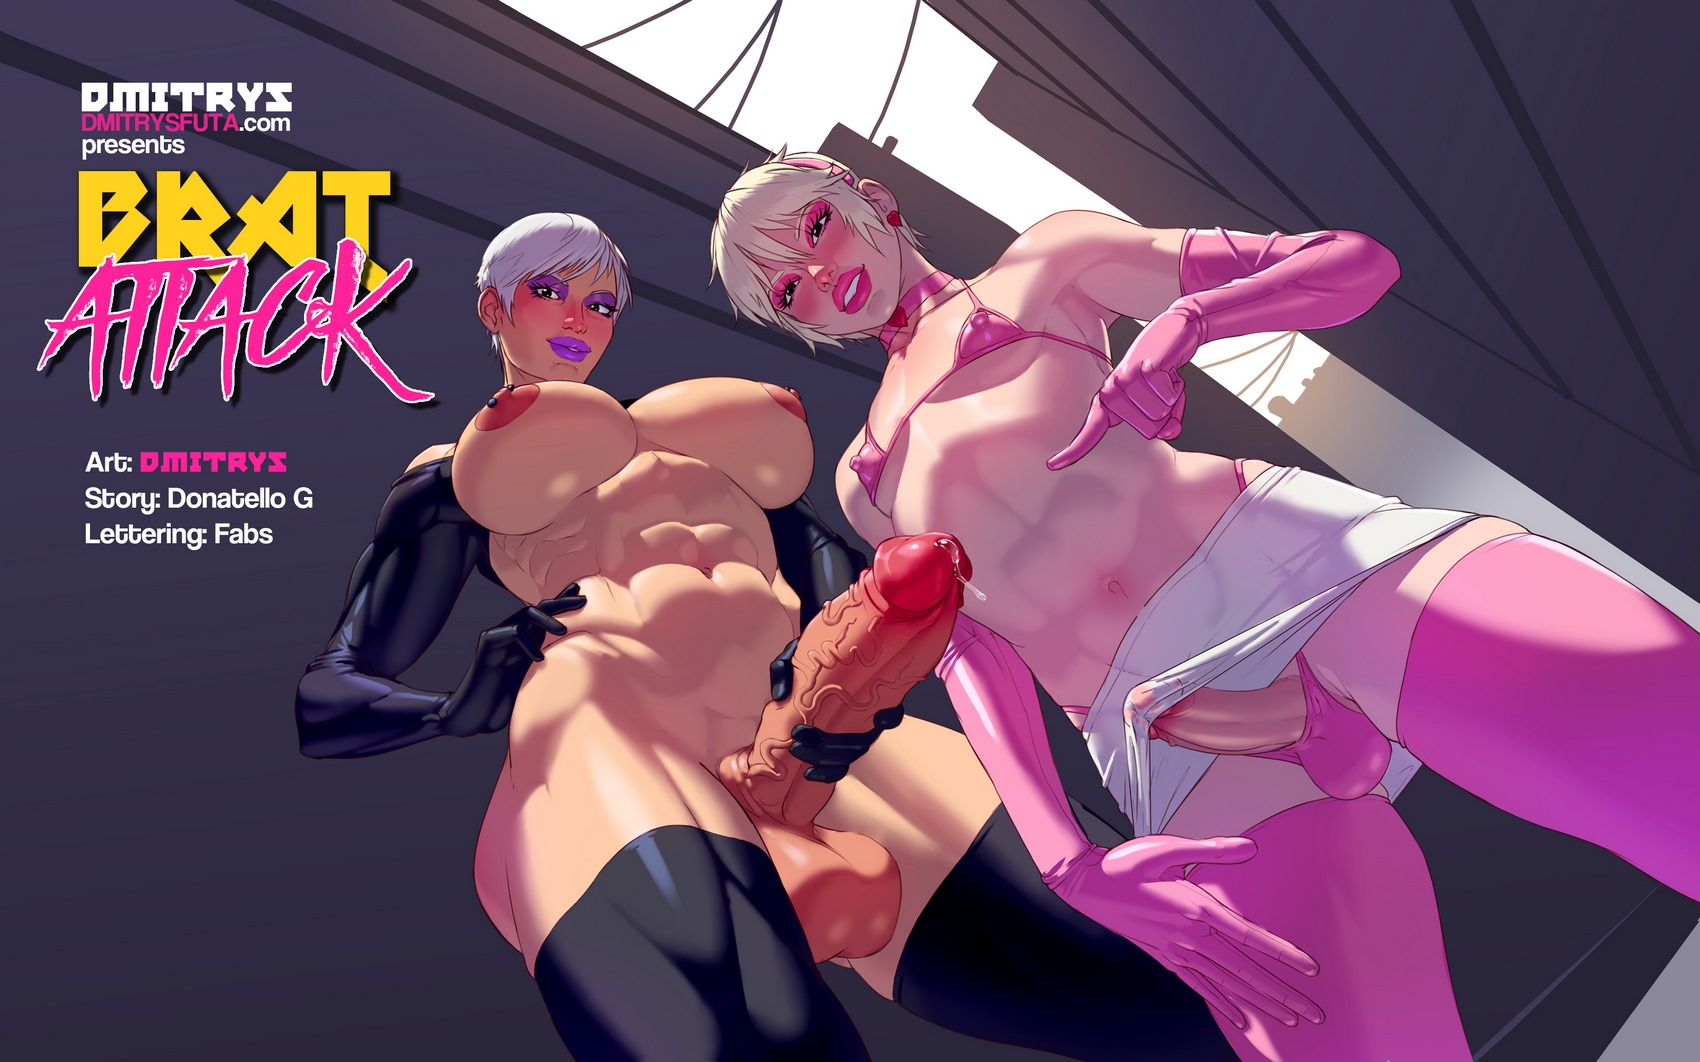 Dmitrys- Brat Attack porn comics 8 muses